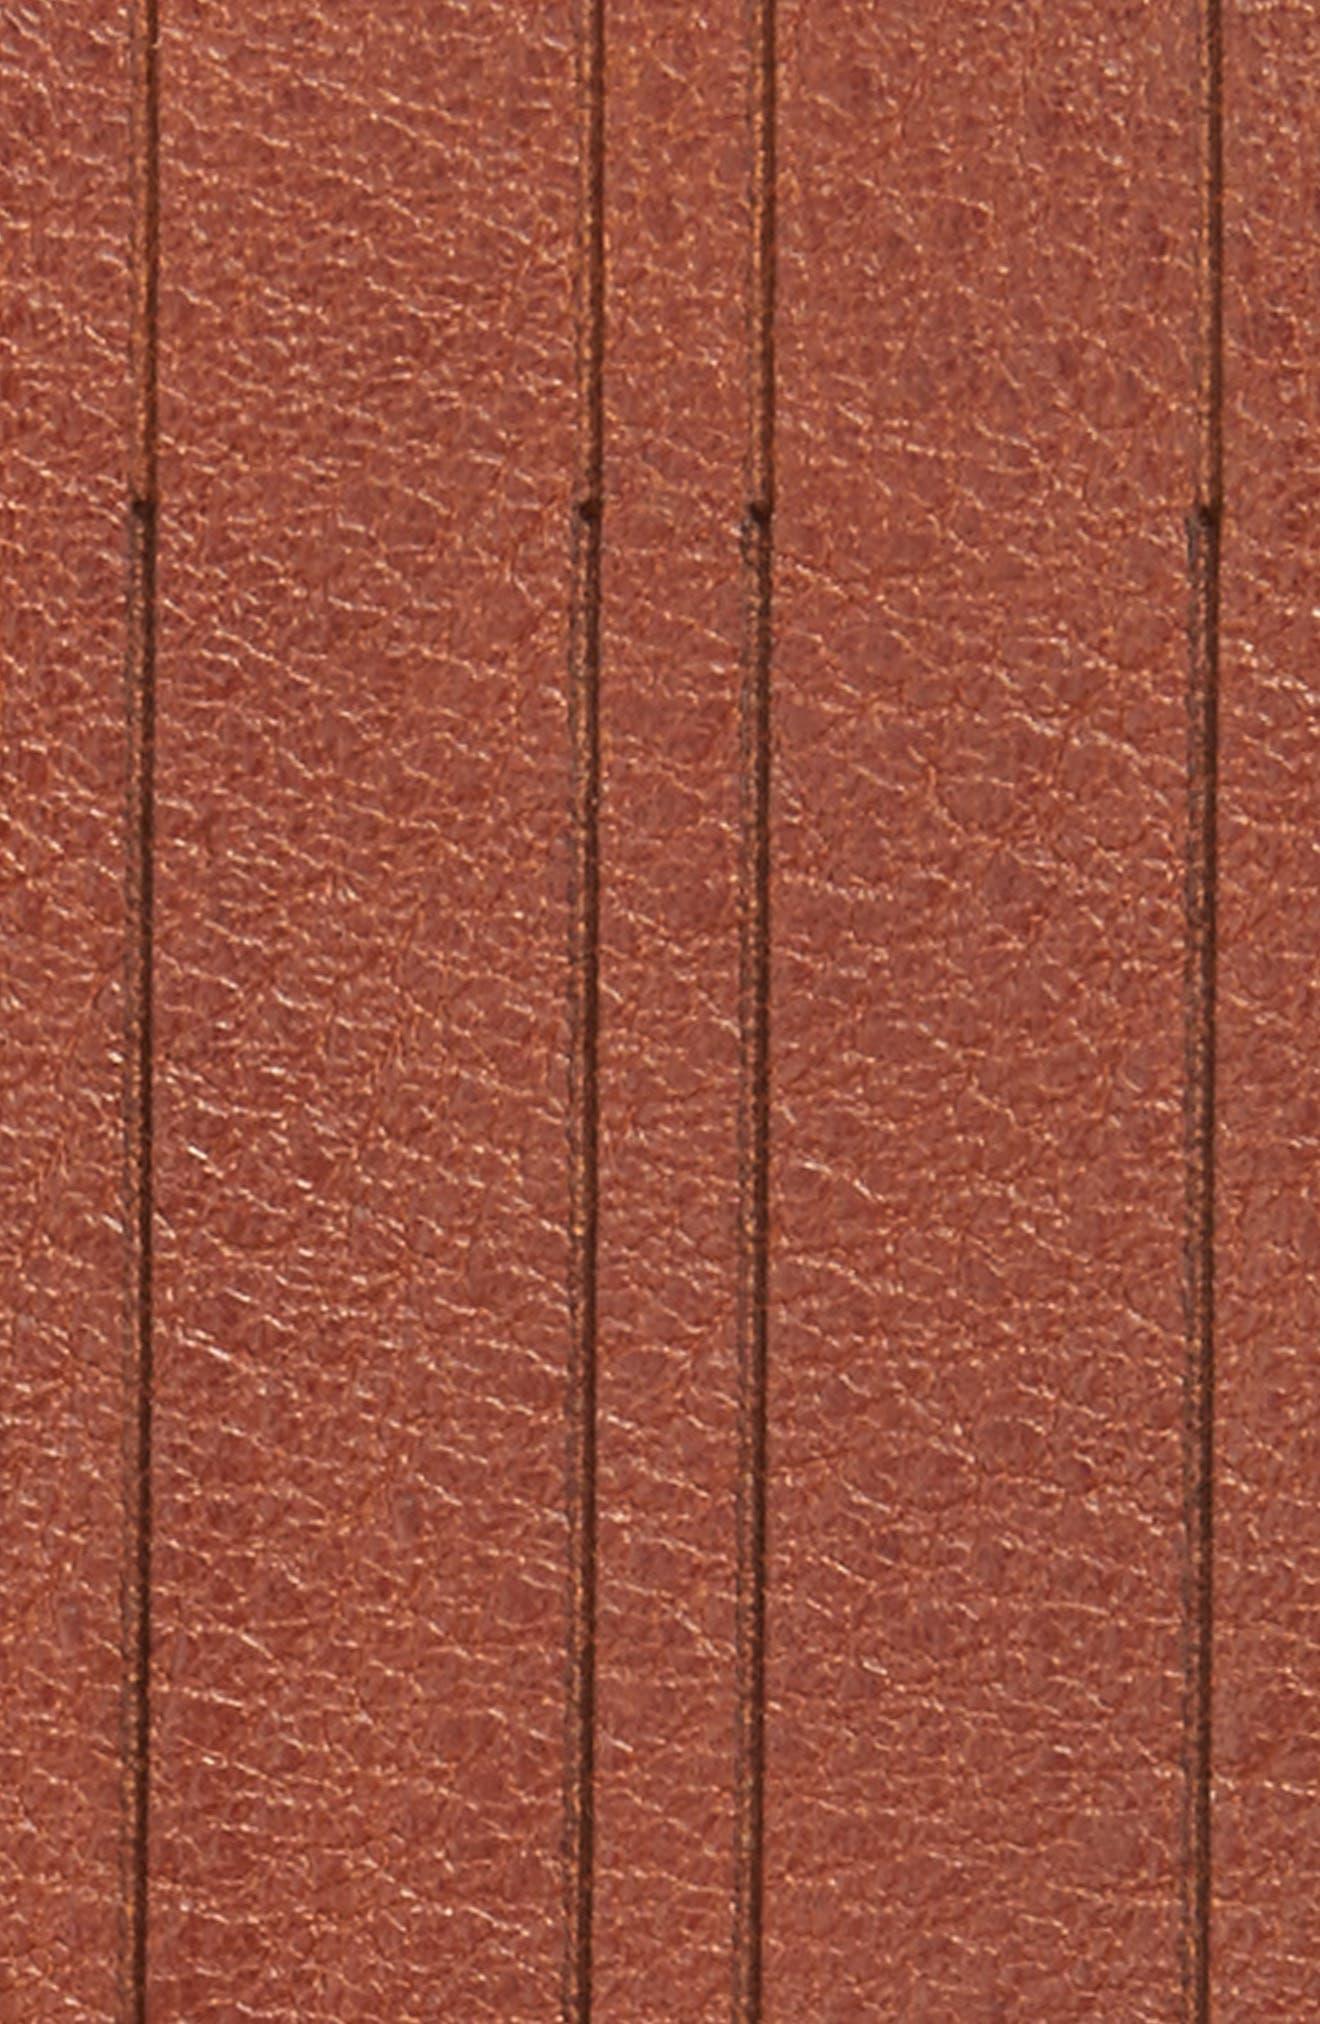 Magno Leather Belt,                             Alternate thumbnail 4, color,